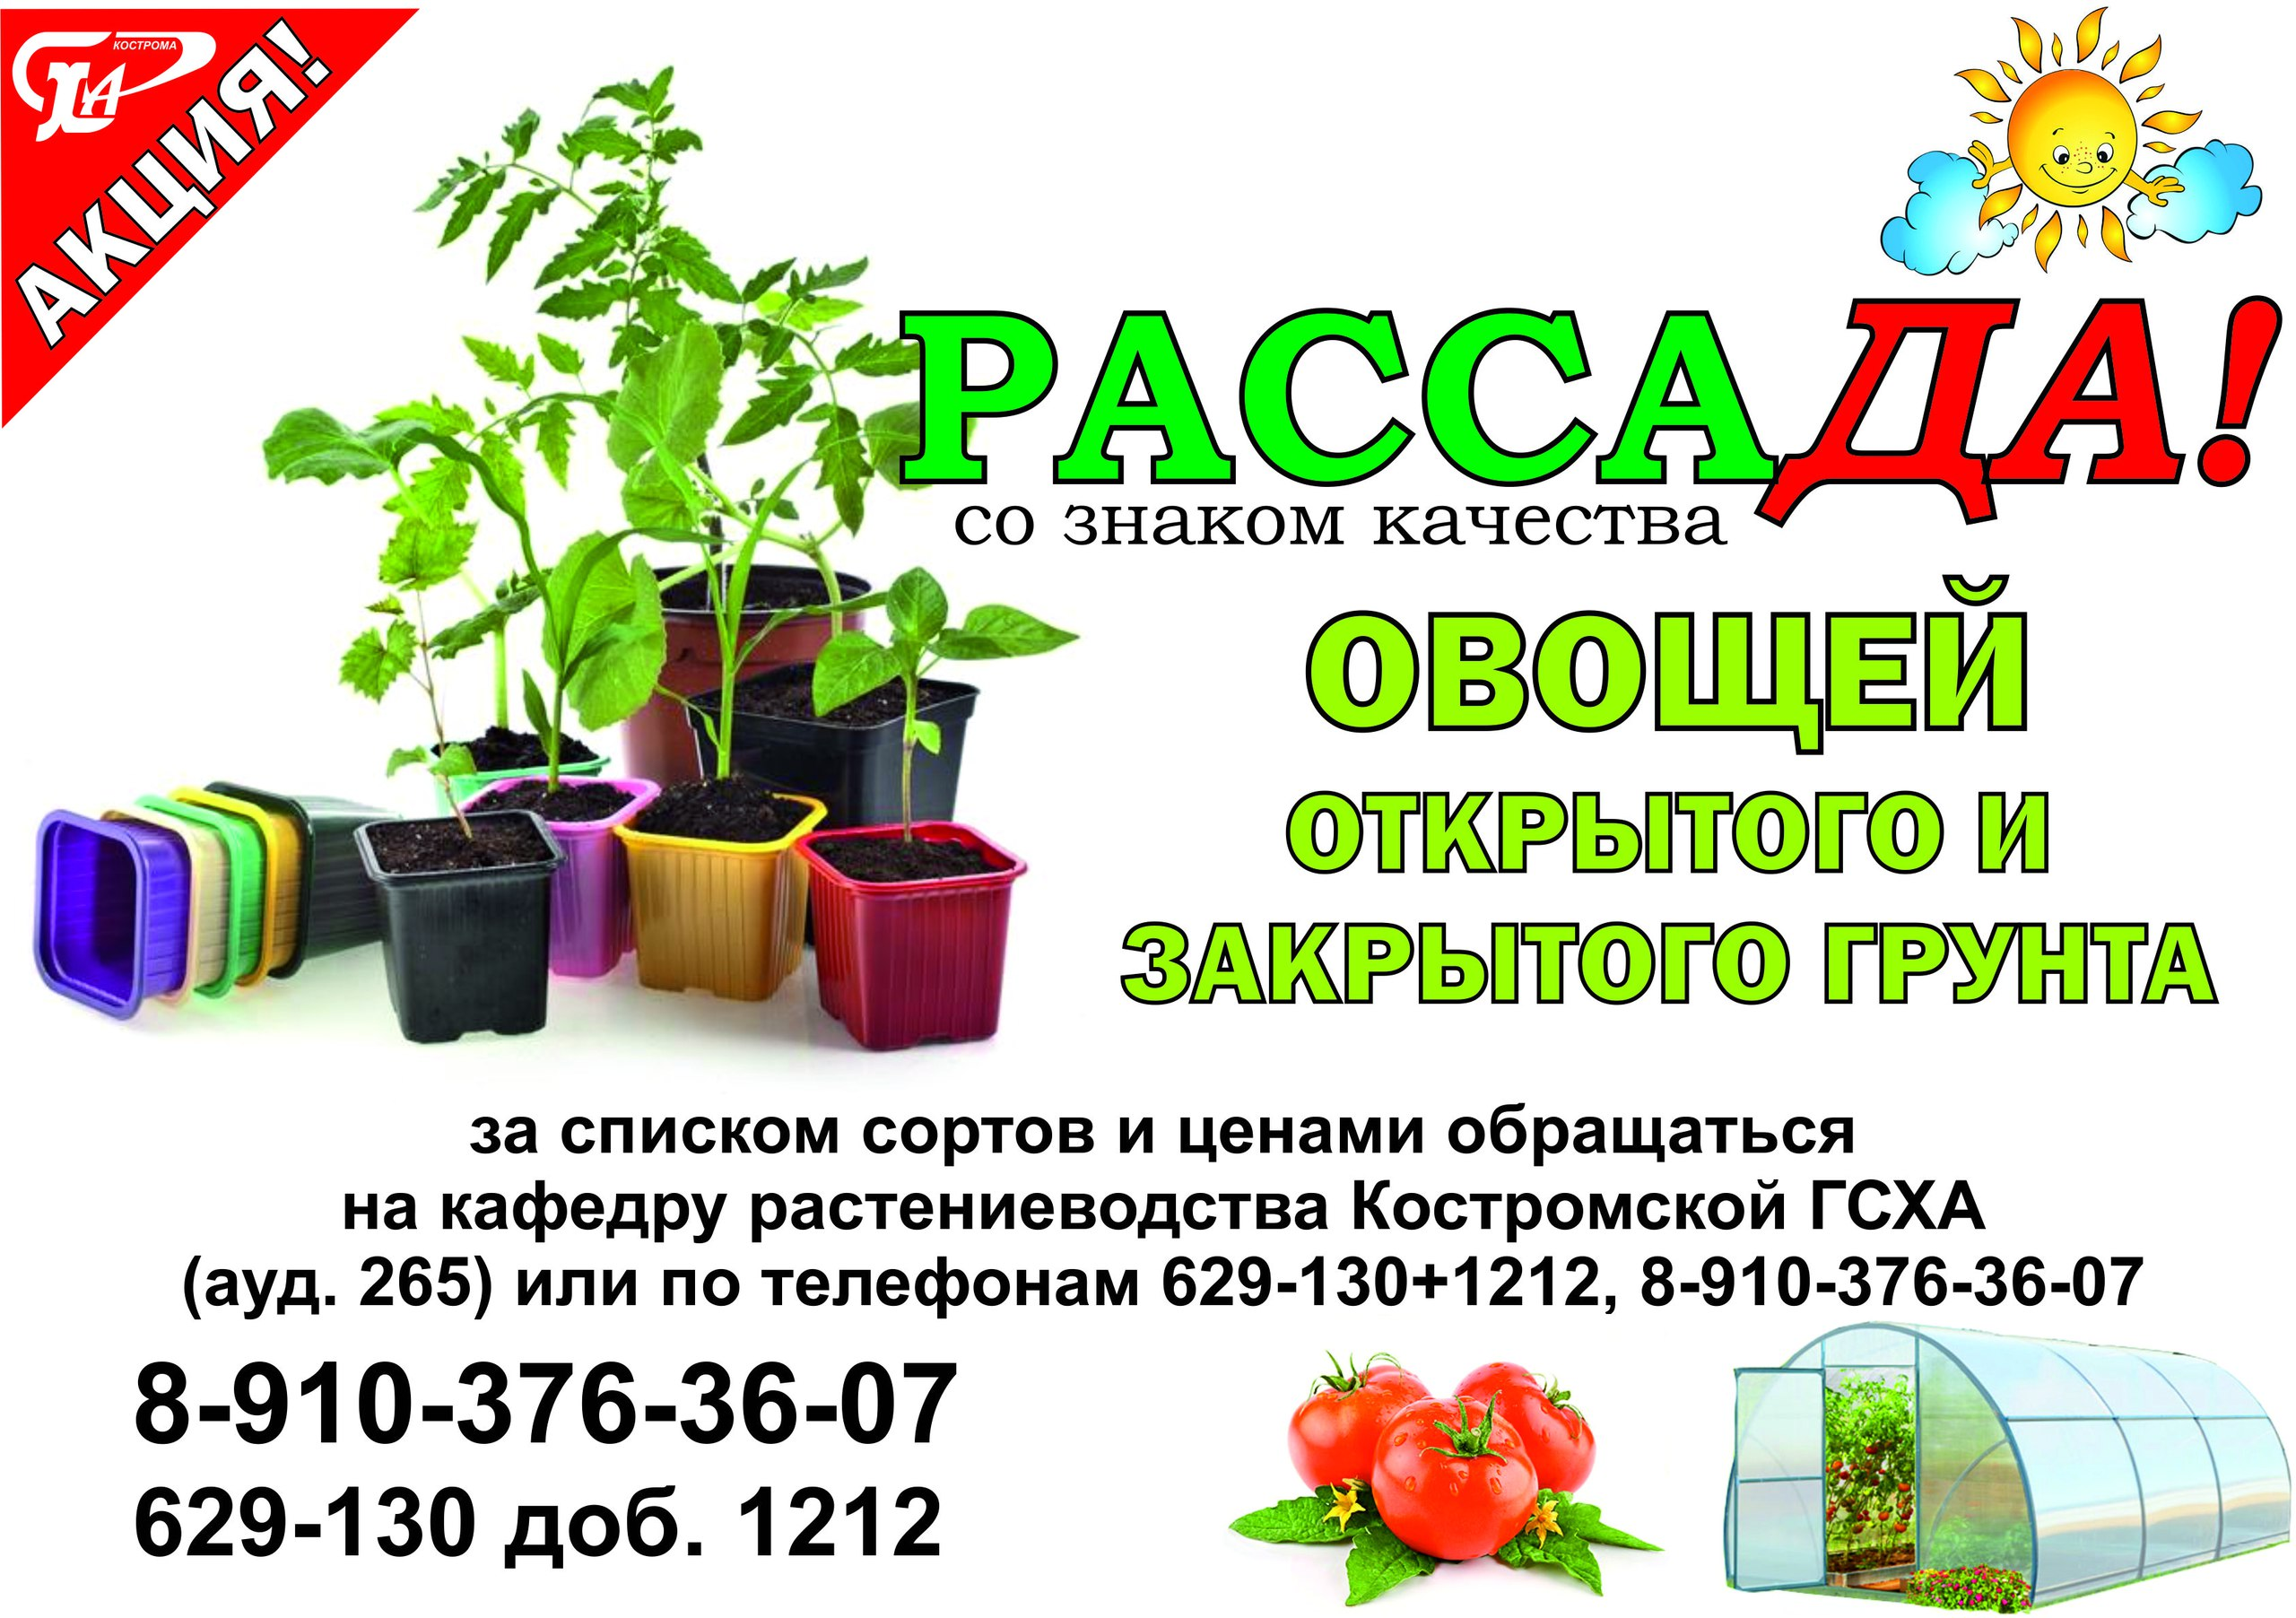 https://pp.userapi.com/c830400/v830400906/e55ec/MK1ZFIUmkU8.jpg